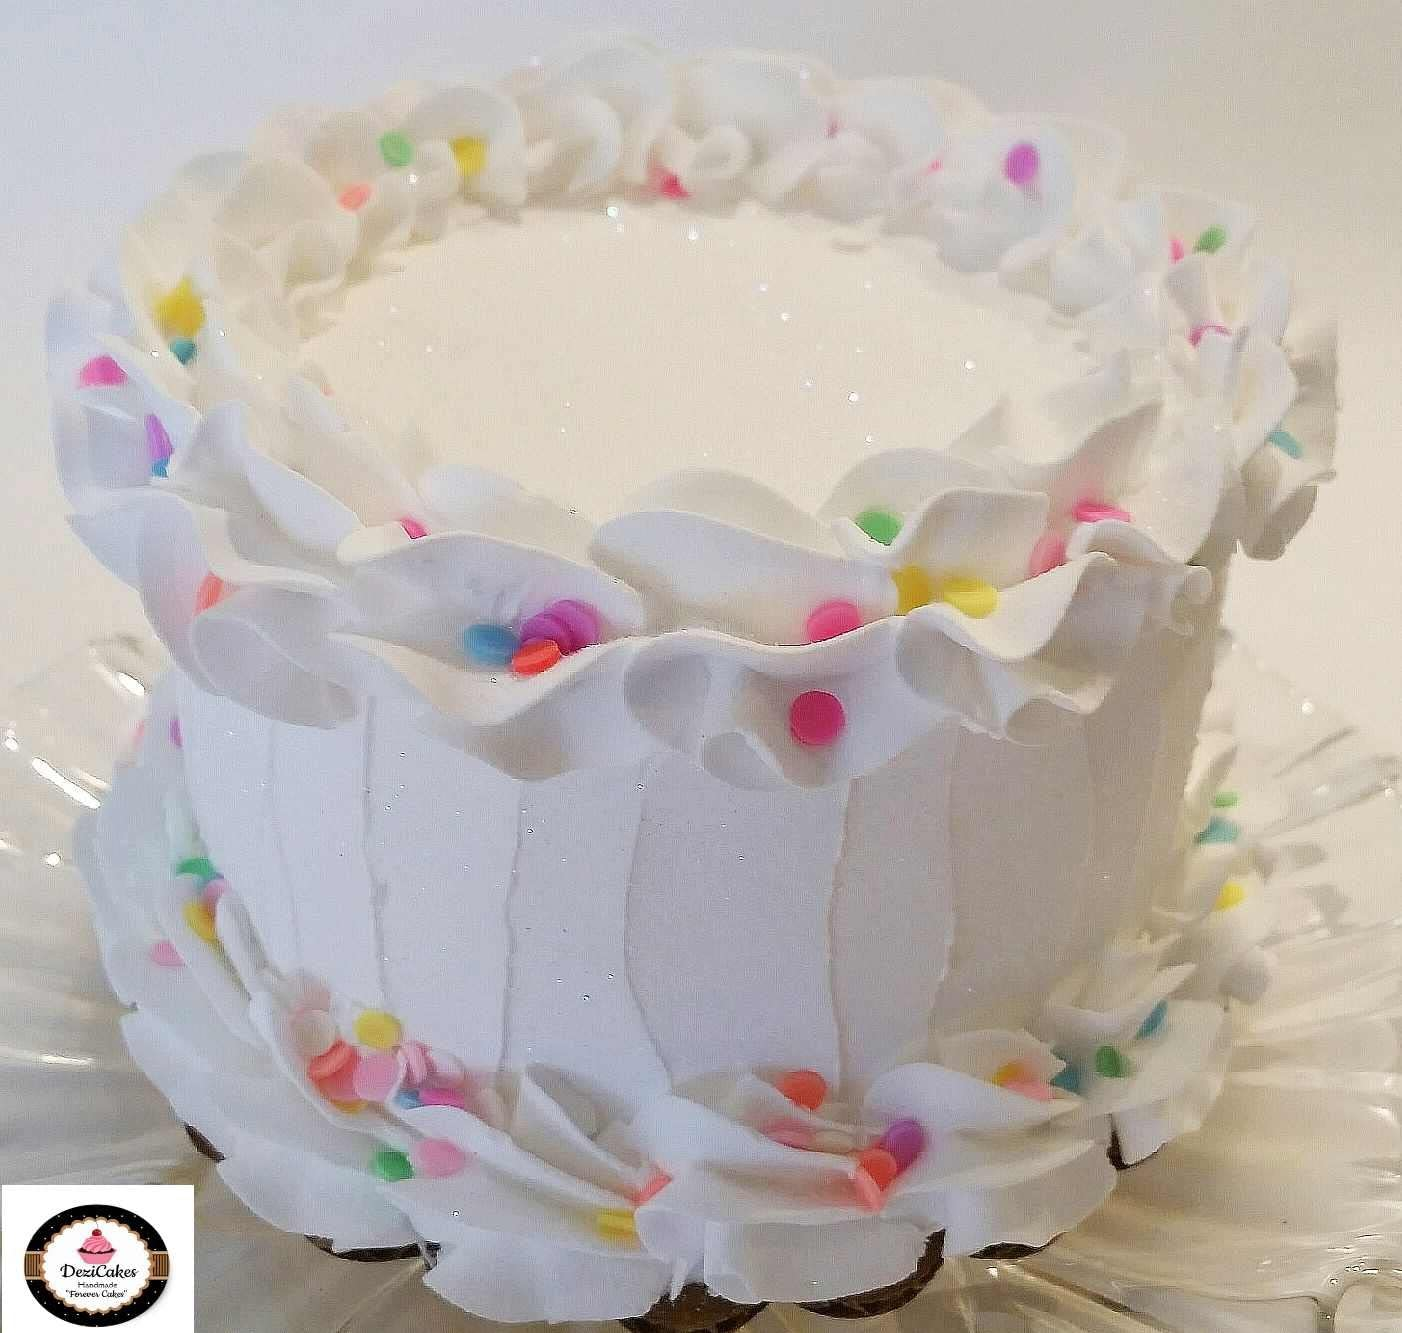 Pleasing Amazon Com Dezicakes Birthday Cake 6 White W Confetti Faux Cake Personalised Birthday Cards Fashionlily Jamesorg